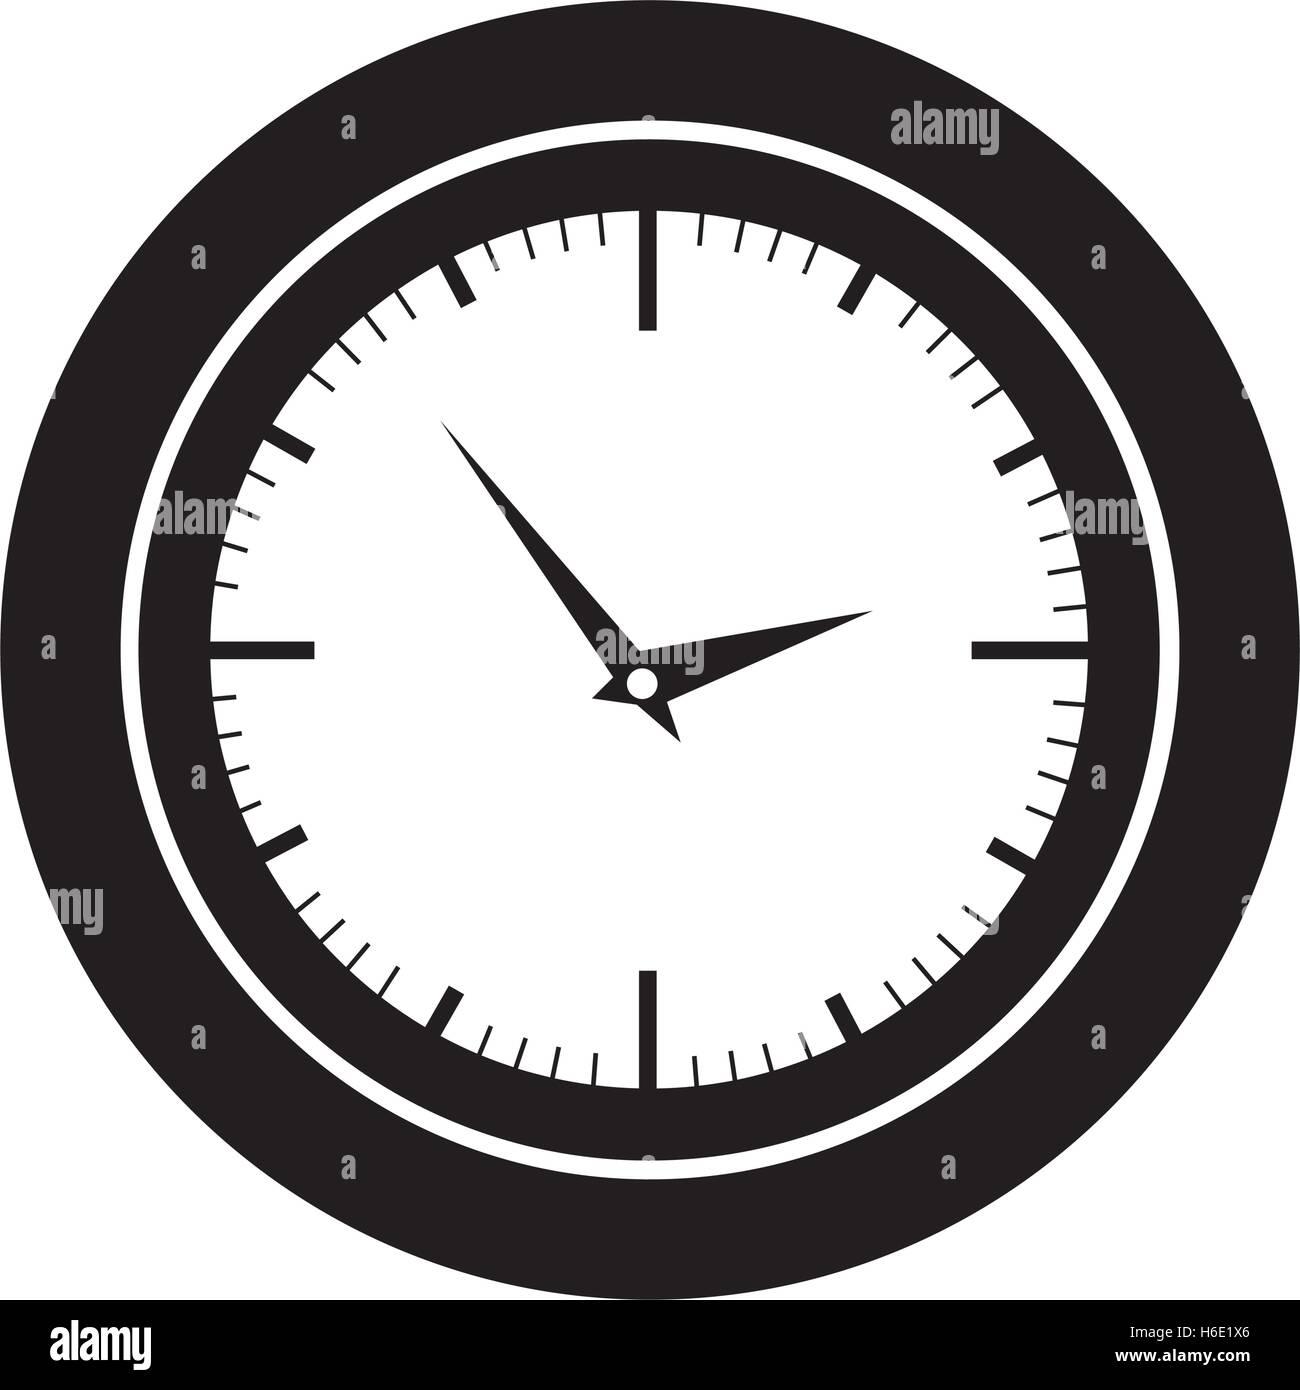 analog clock icon image vector illustration design Stock